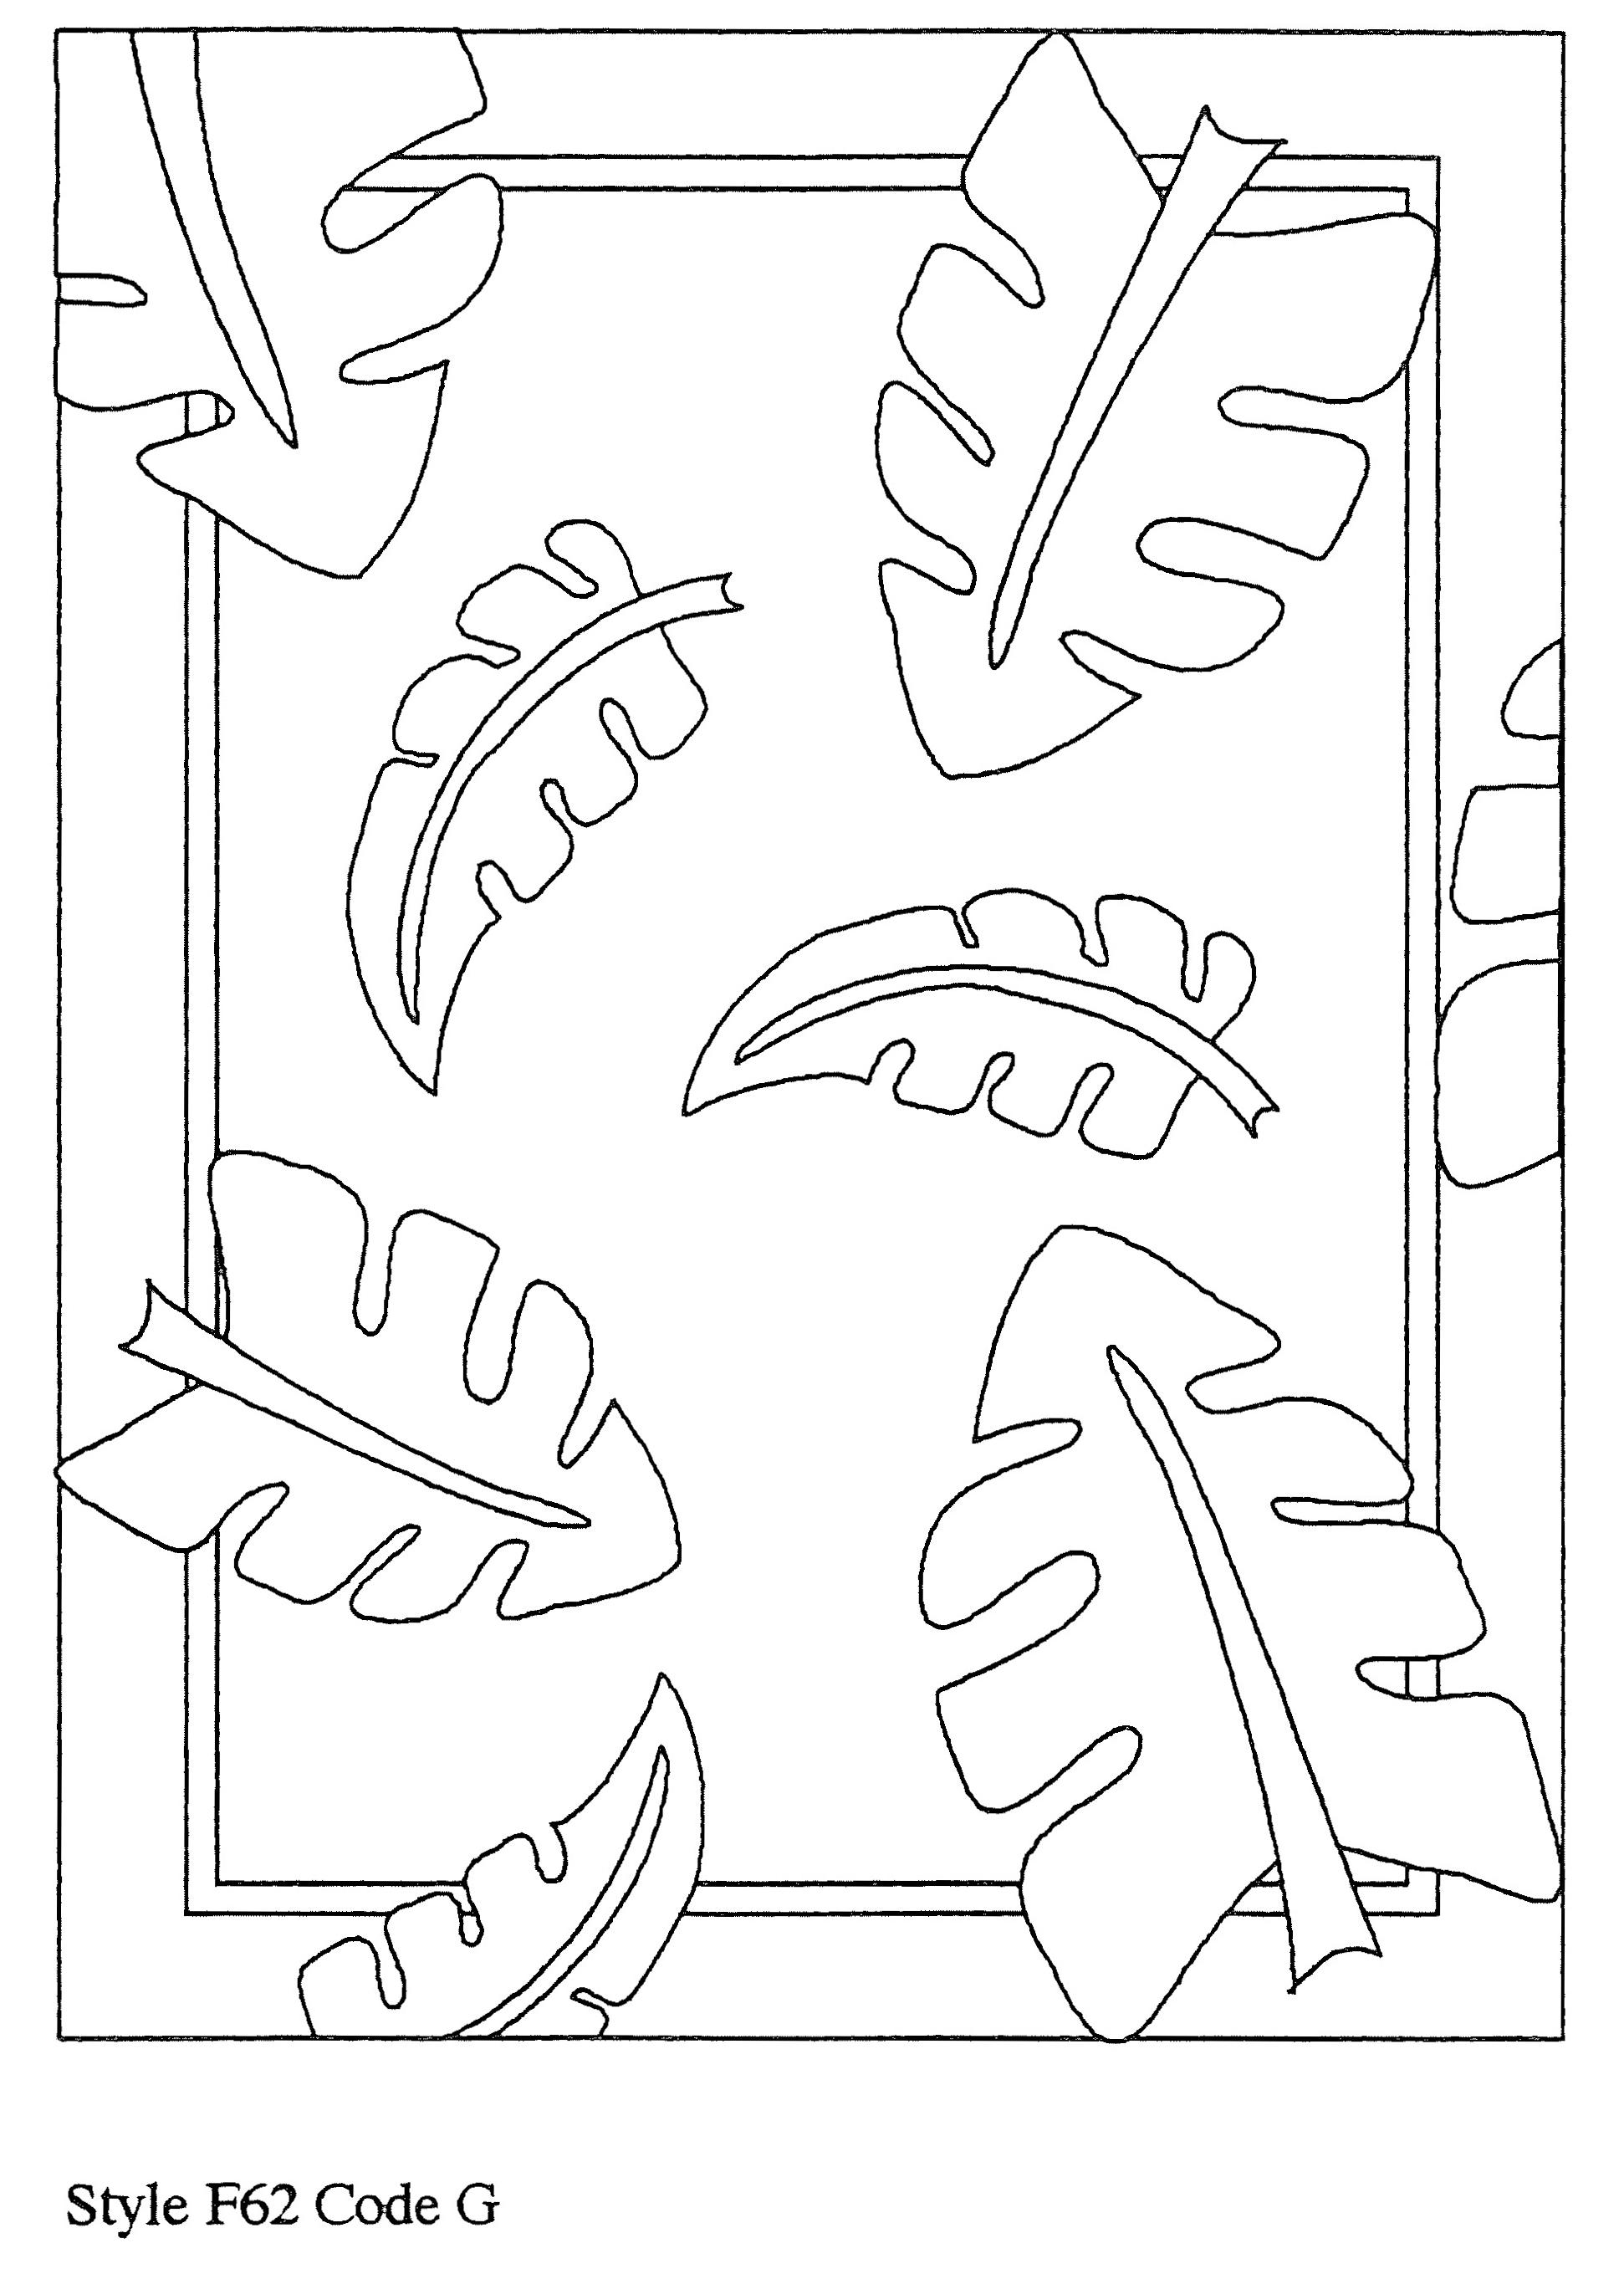 Page 20 copy 3.jpg